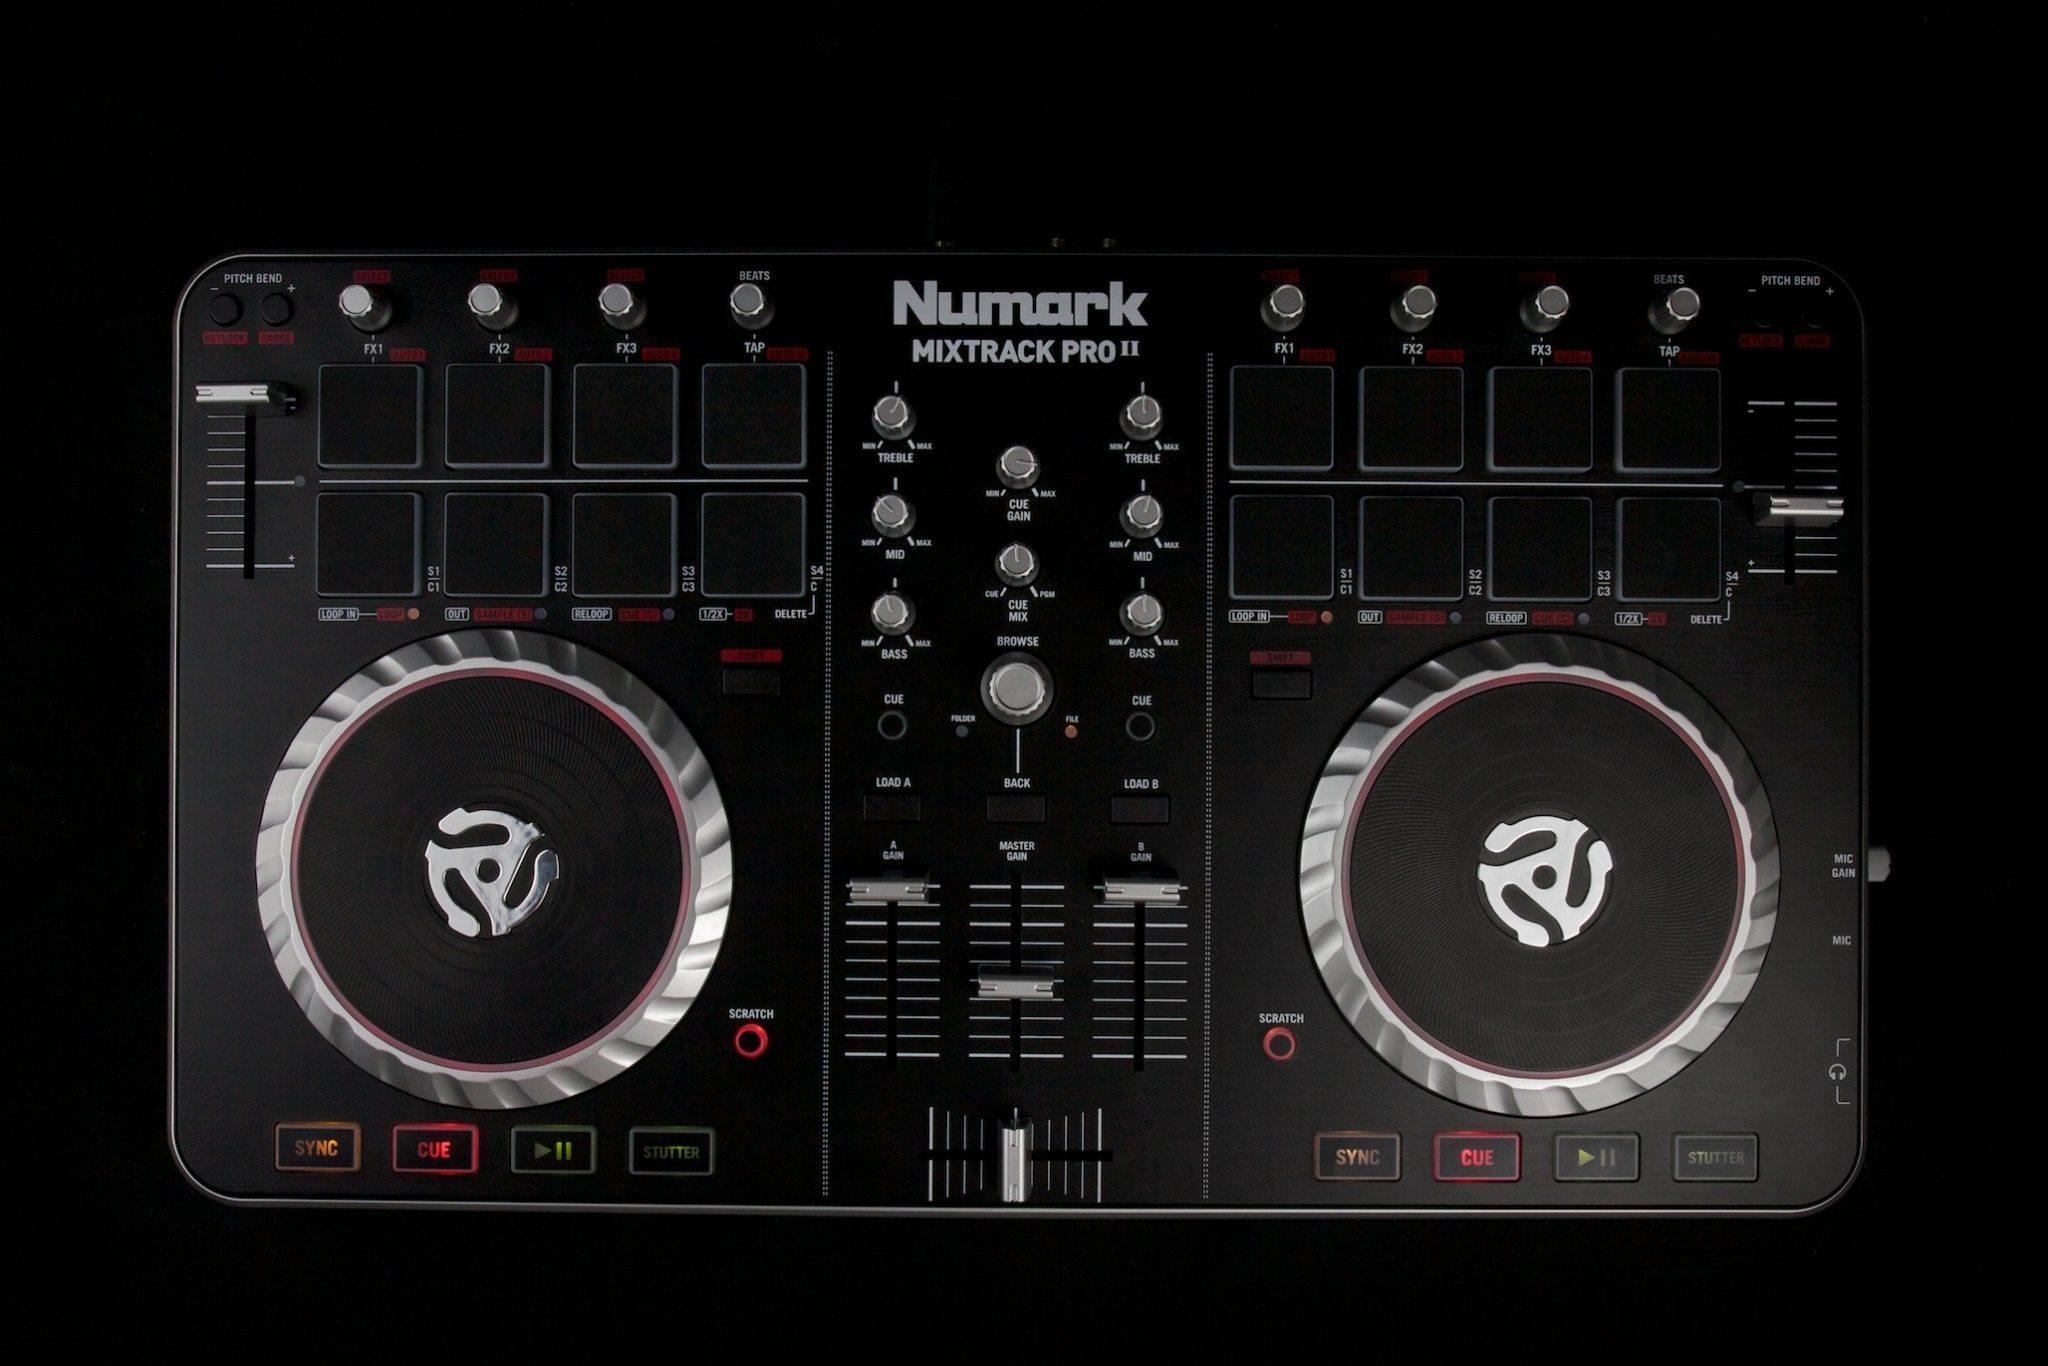 REVIEW: Numark Mixtrack Pro II DJ Controller   DJWORX on numark mixtrack pro scratching, numark mixtrack vs mixtrack pro, numark mixtrack pro pitch bend, numark mixtrack pro software,